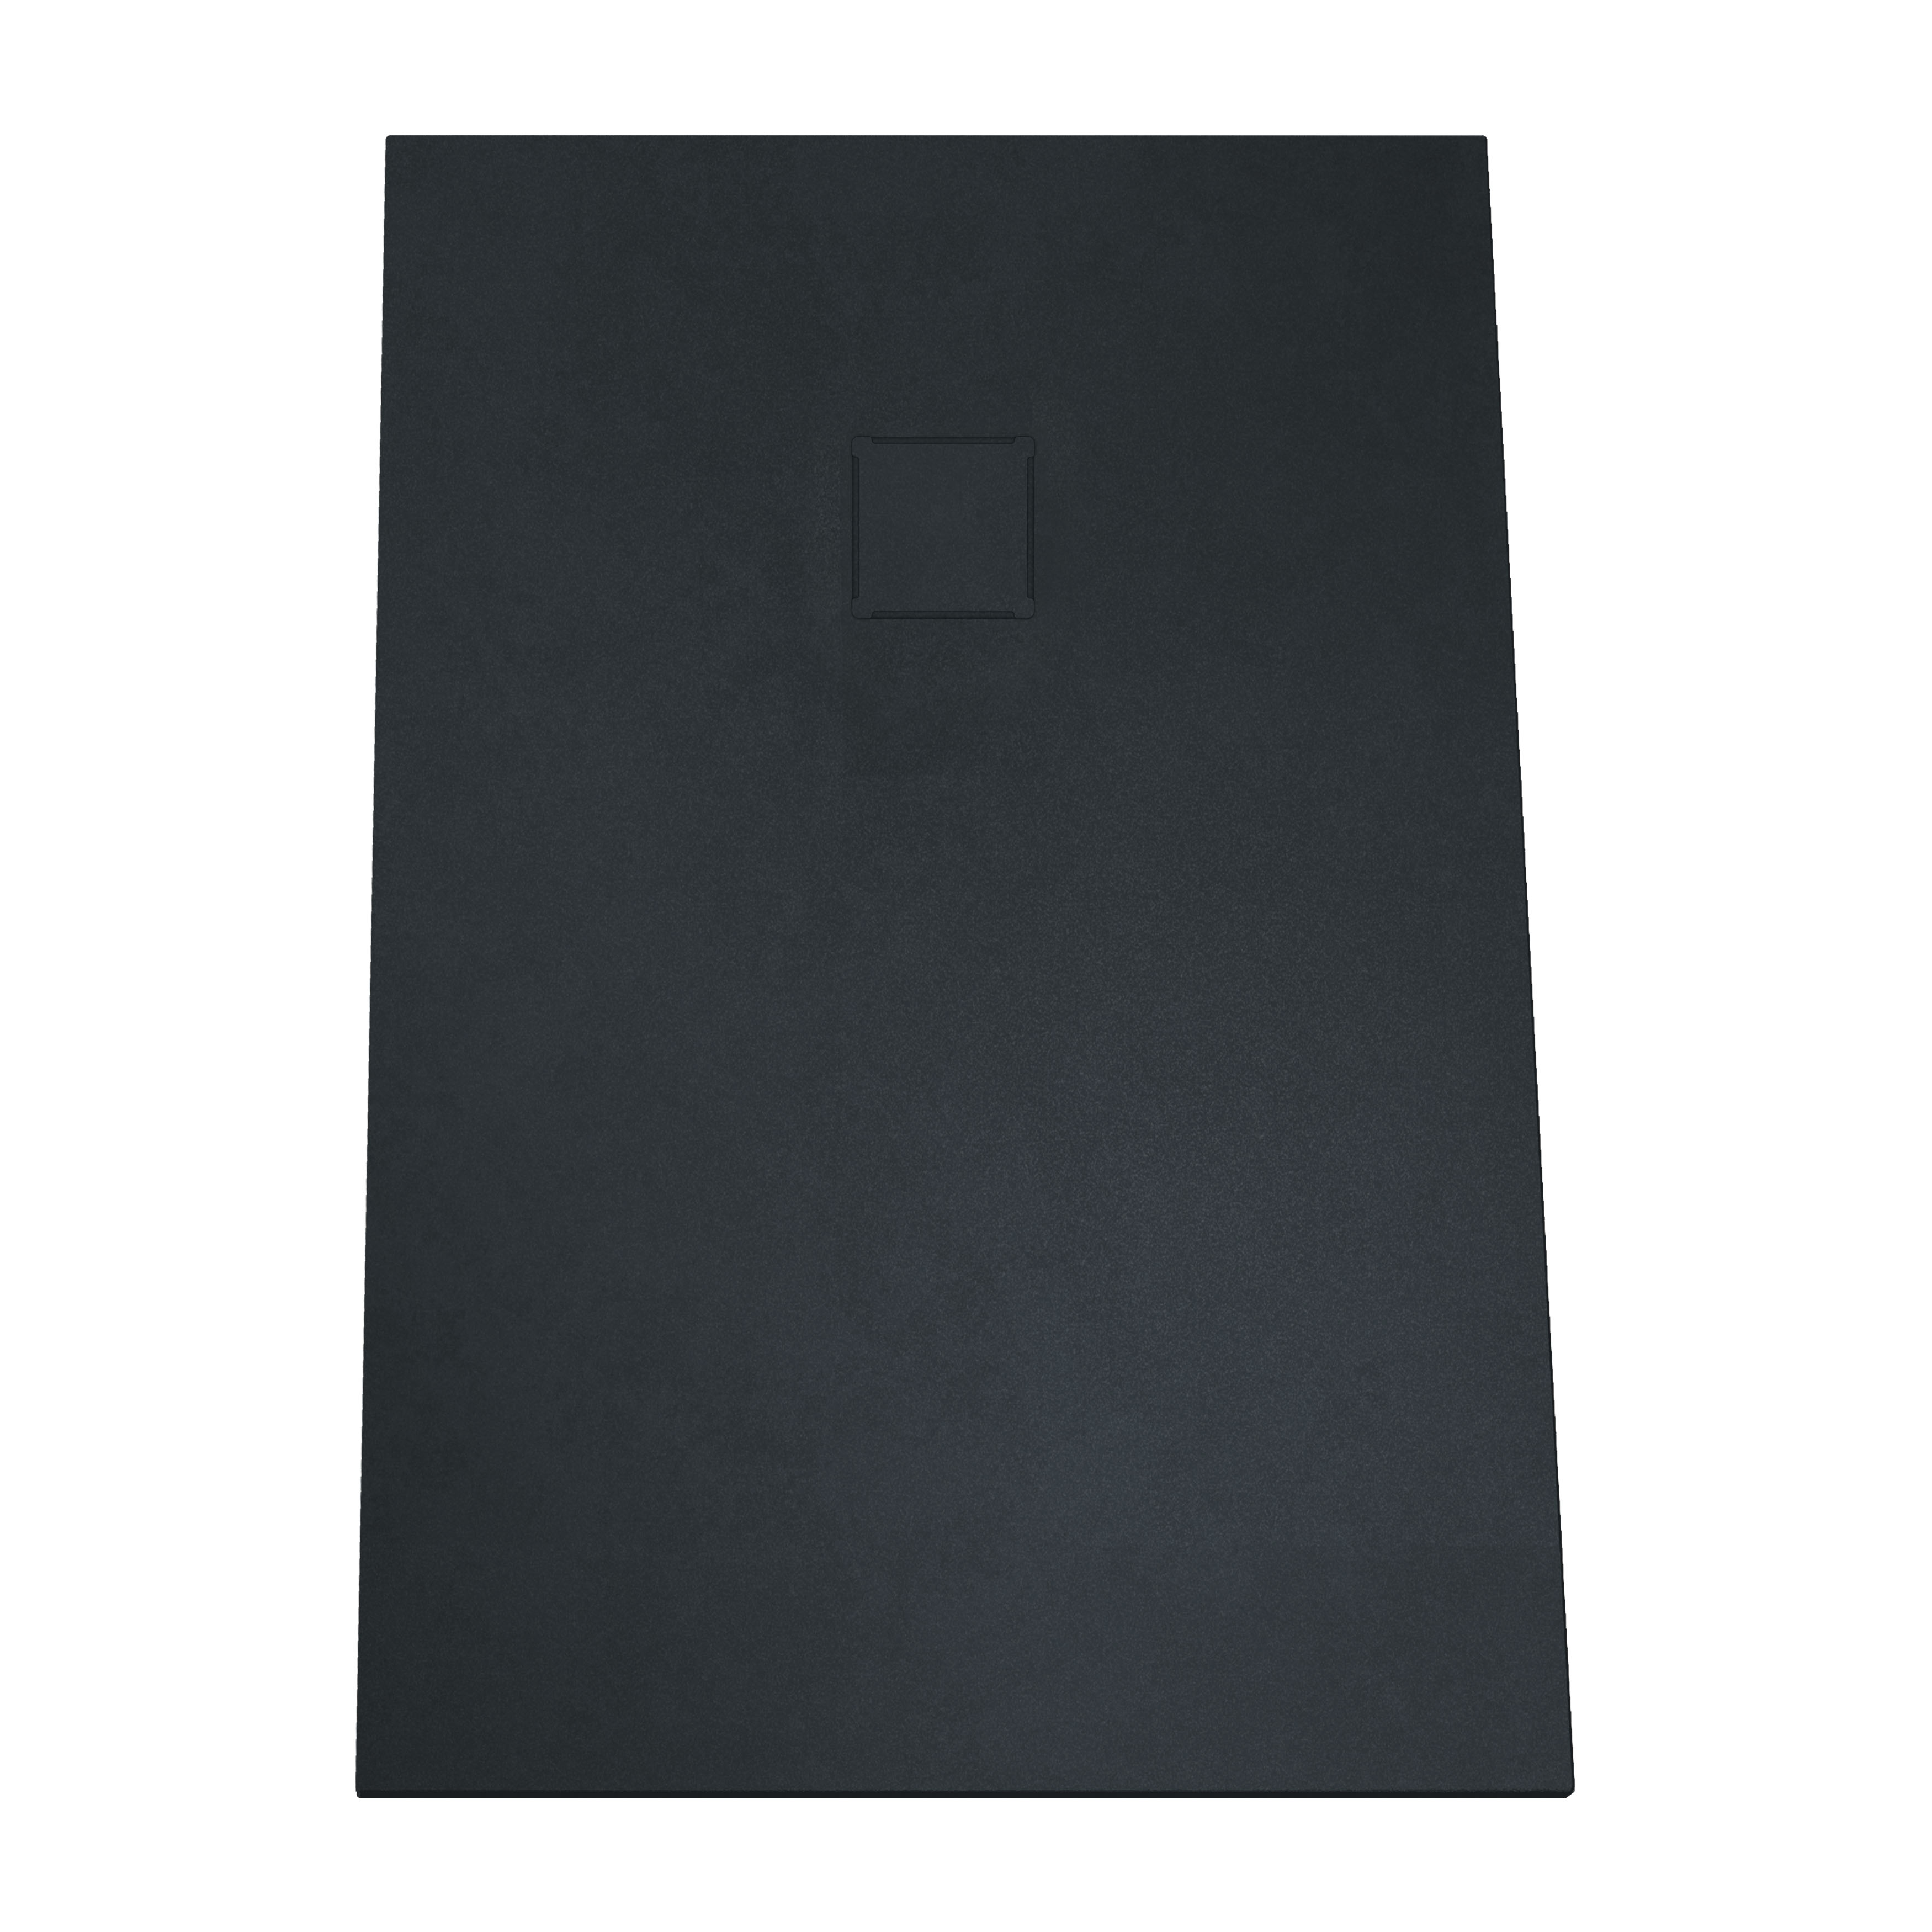 V-stone, receveur ultra plat en solid stone, 120  x  70 cm anthraciteacite